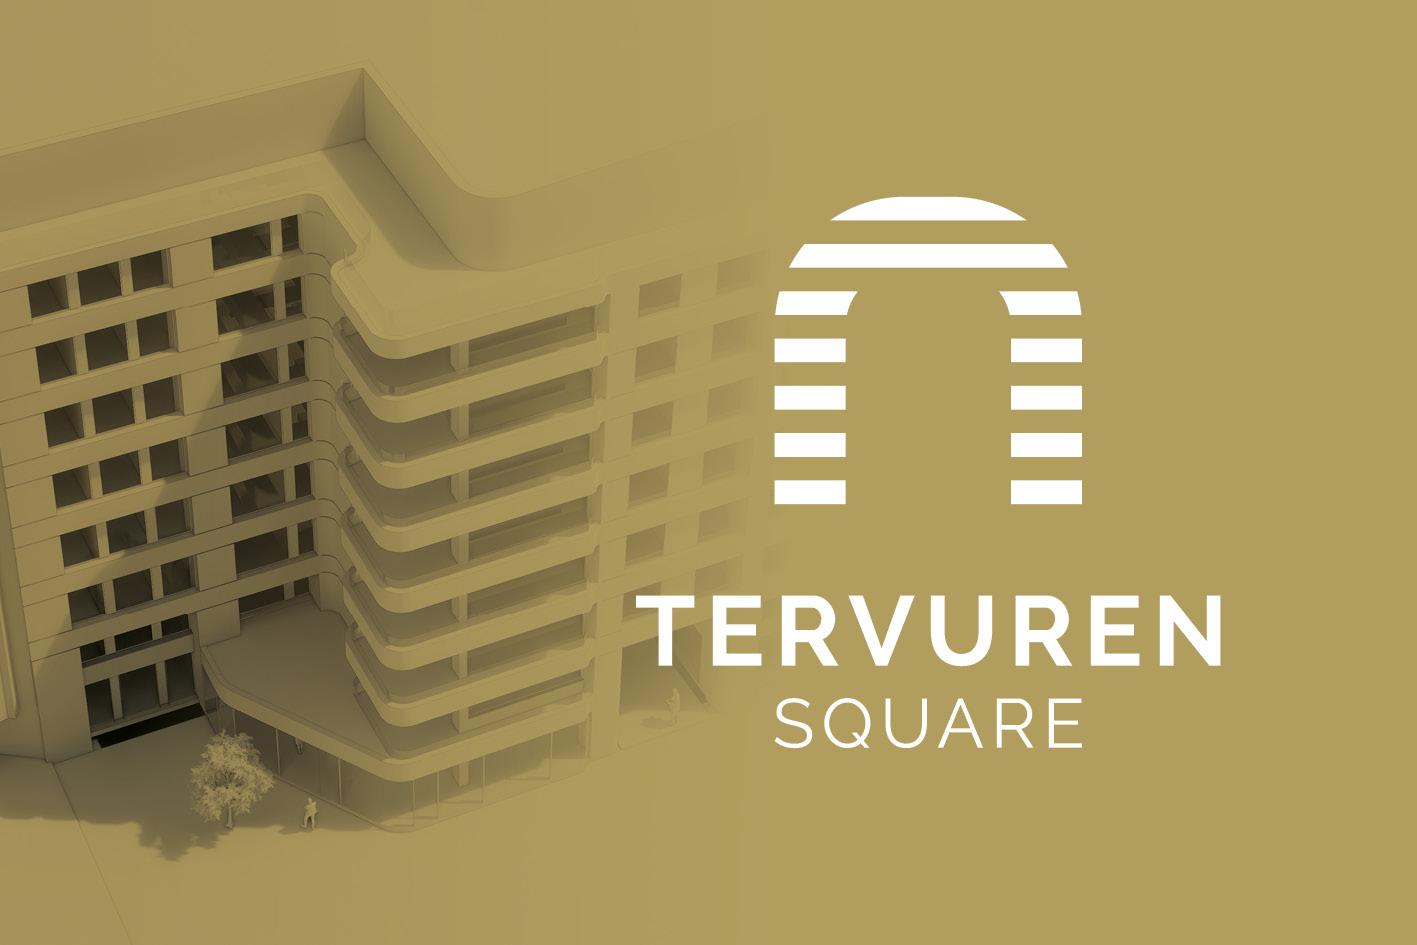 Tervuren Square